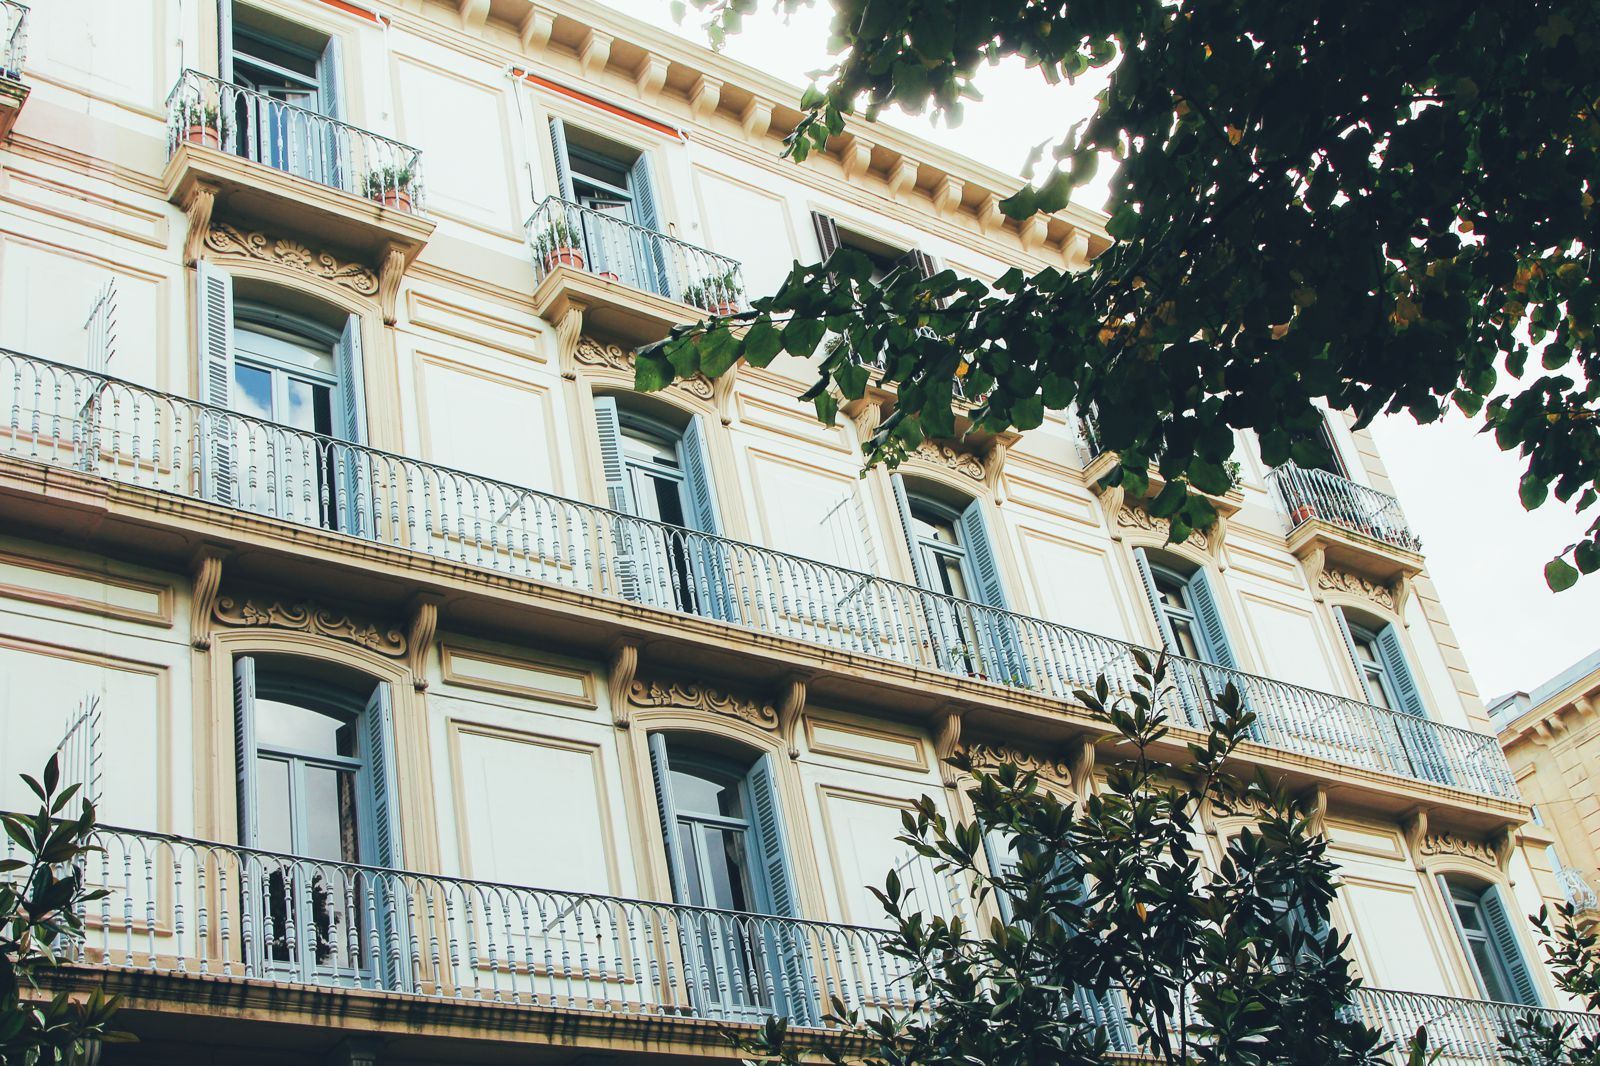 The Most Beautiful City in Spain. San Sebastian, Gipuzkoa, Spain, Hotel Londres (4)